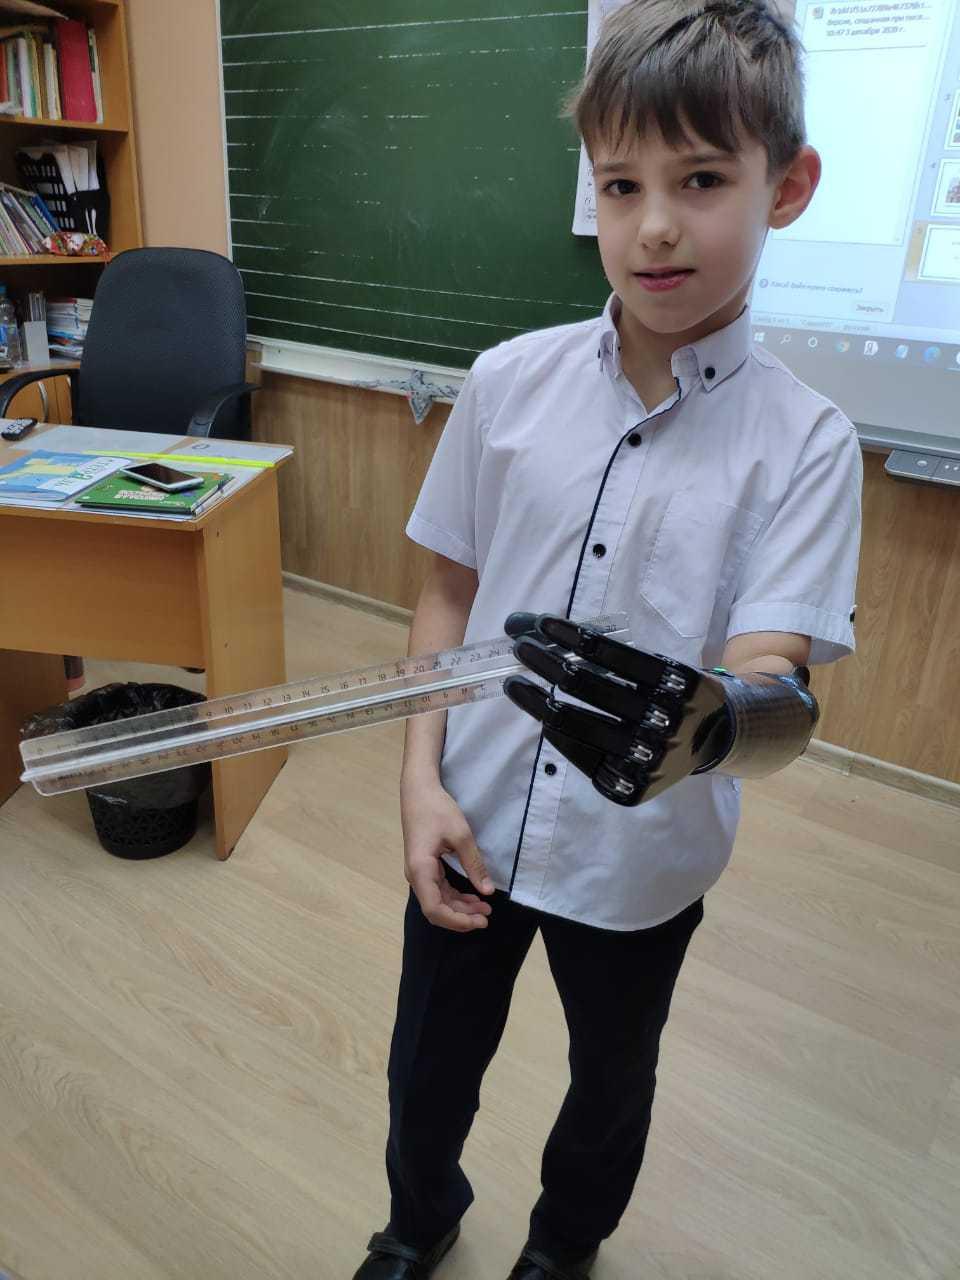 бионический протез руки для ребенка